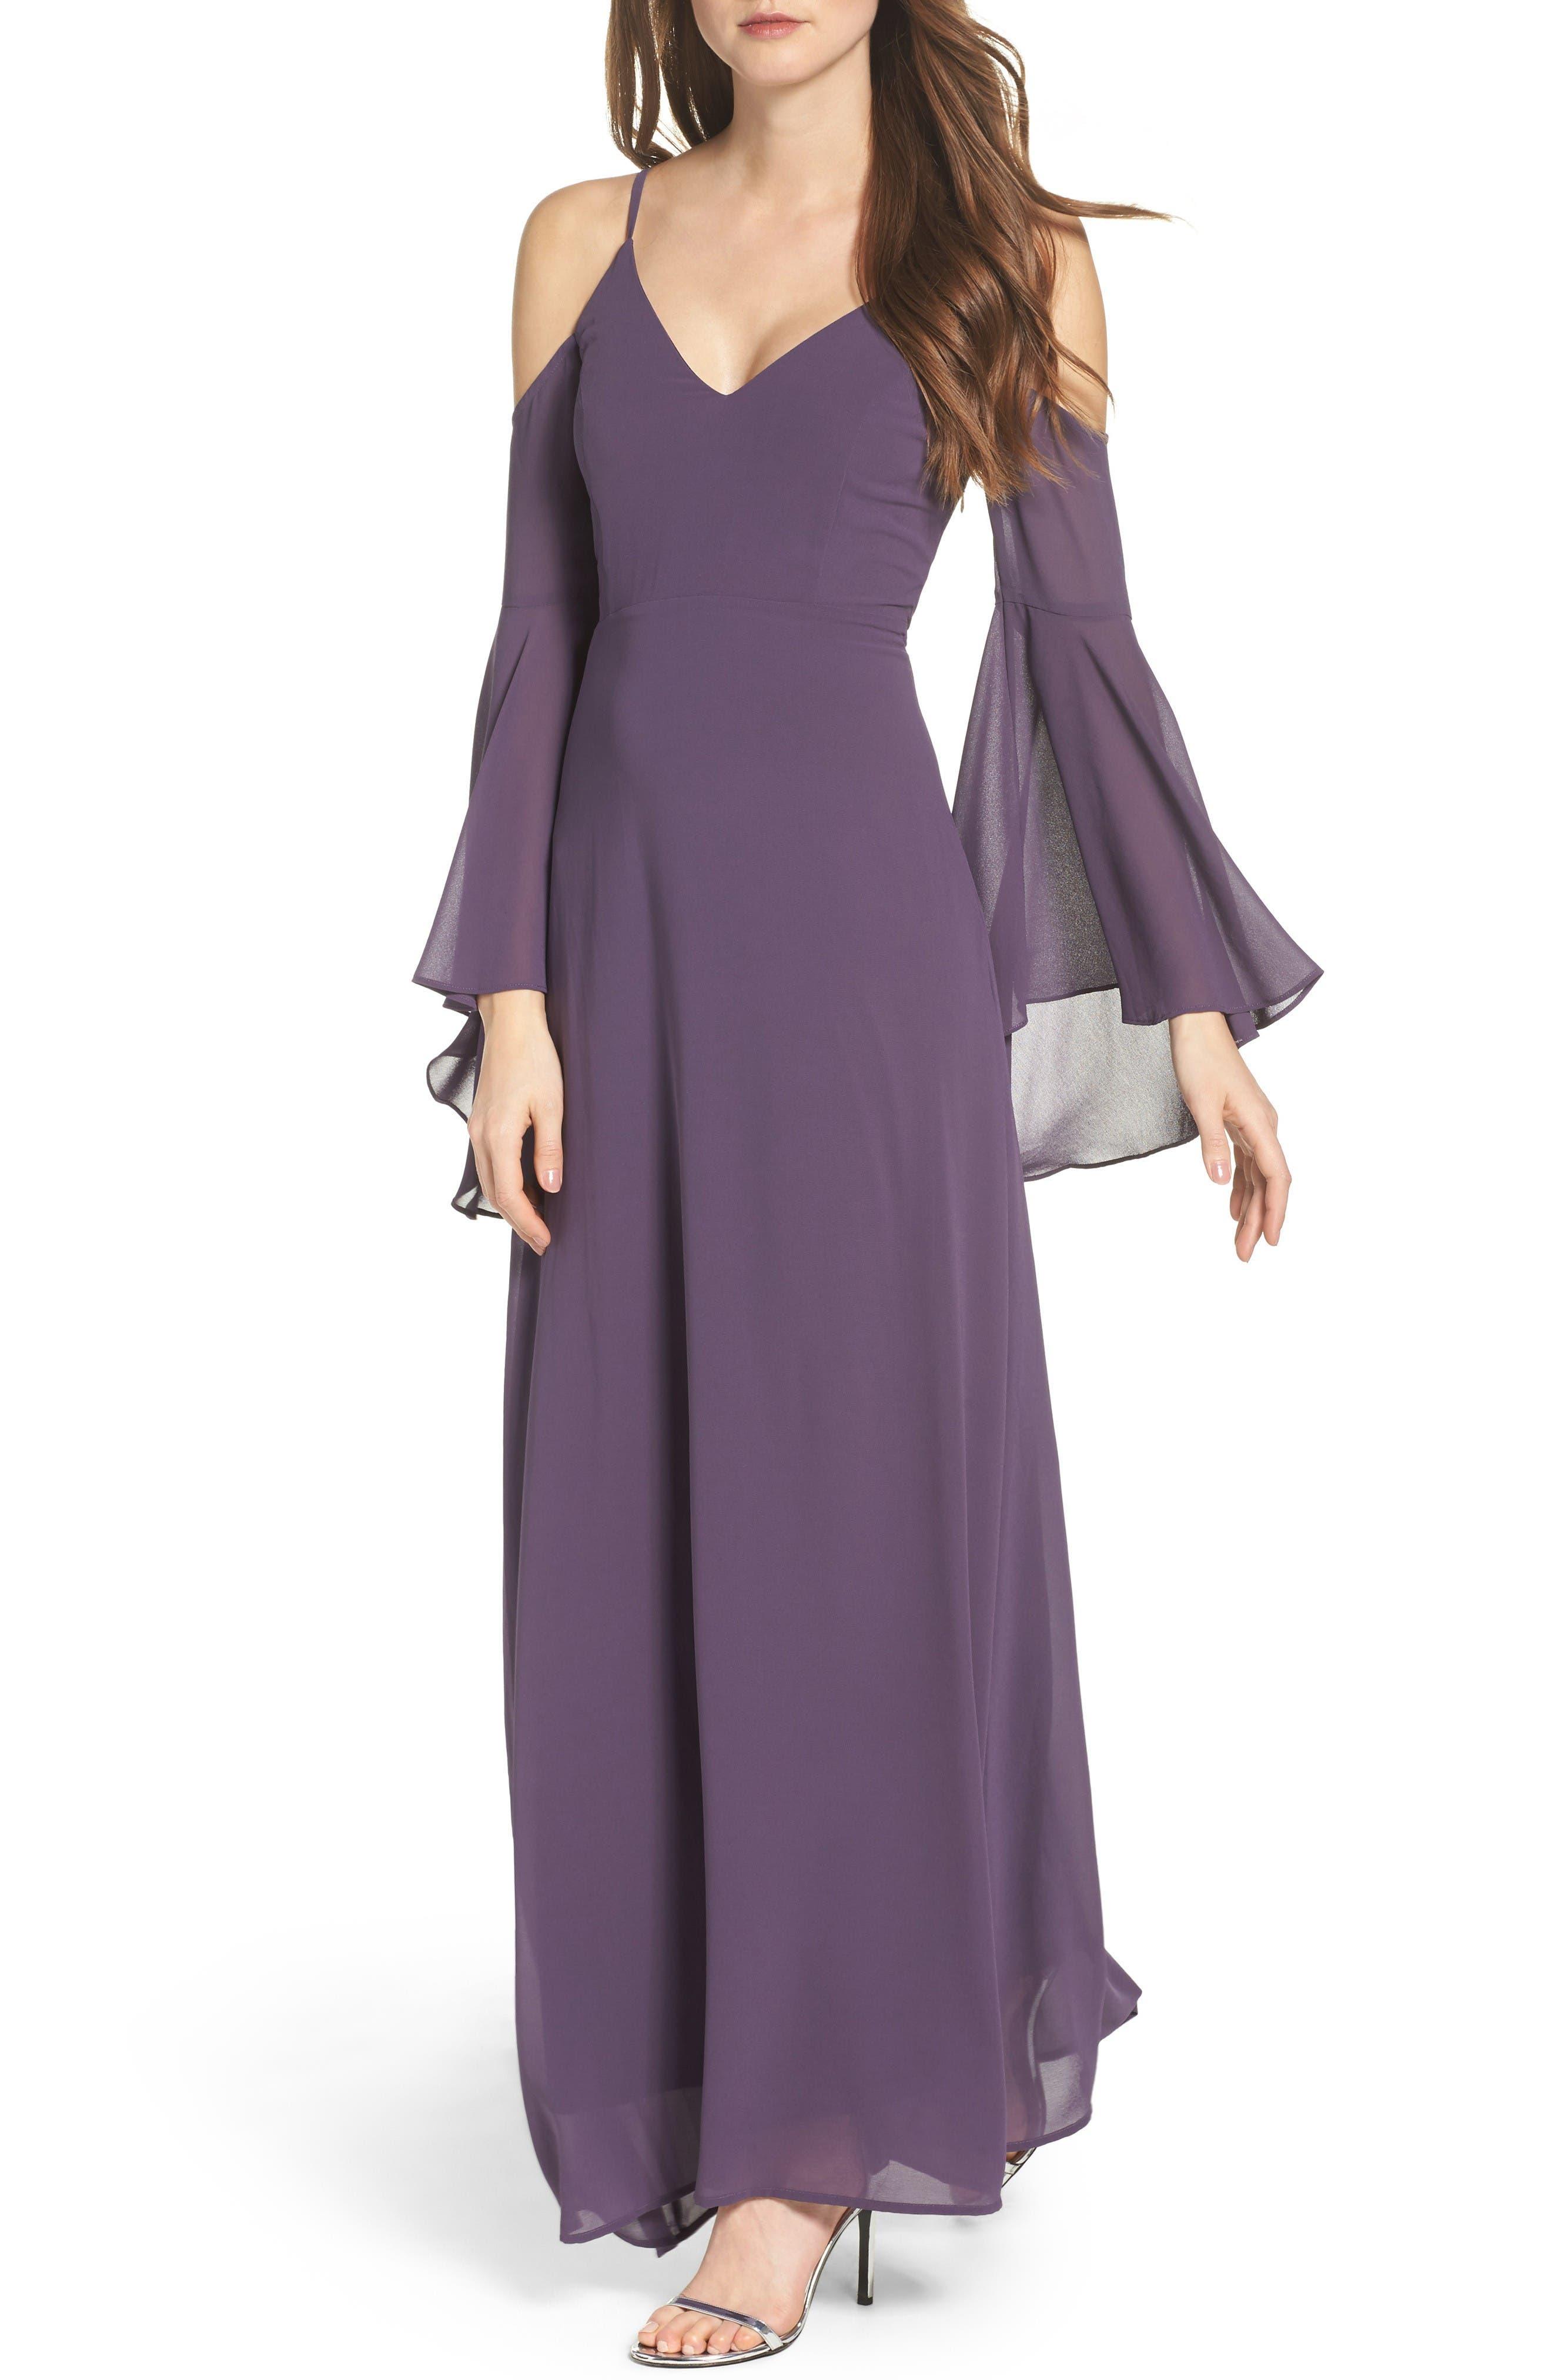 Alternate Image 1 Selected - Lulus Cold Shoulder Chiffon Maxi Dress